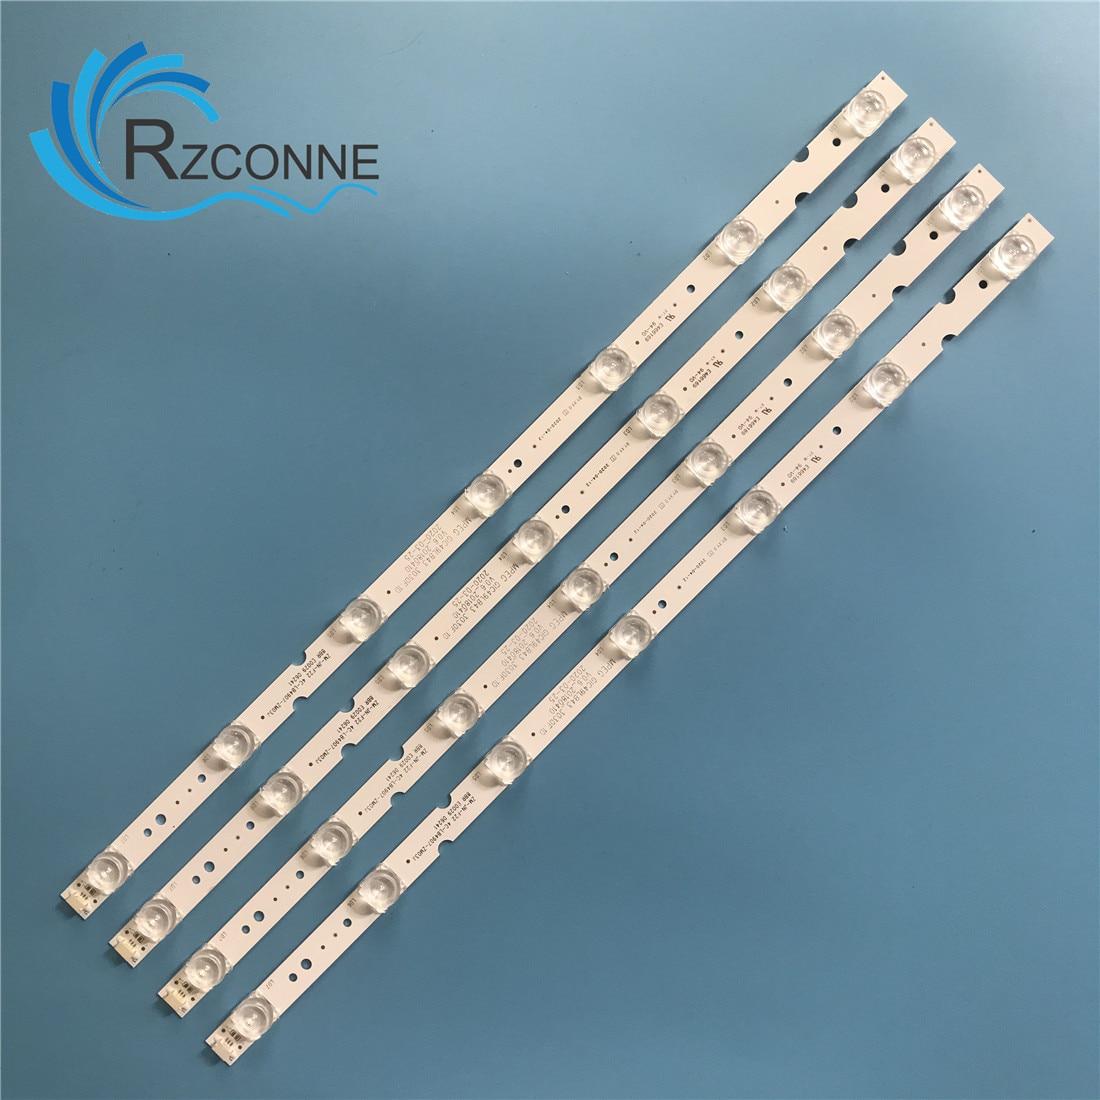 LED شريط إضاءة خلفي 7 مصباح ل TCL 49 'TV 49HR330M07A0 V3 4C-LB4907-HR01J 49A260 49A261 49S2 JL.D49071330-365AS-M_V03